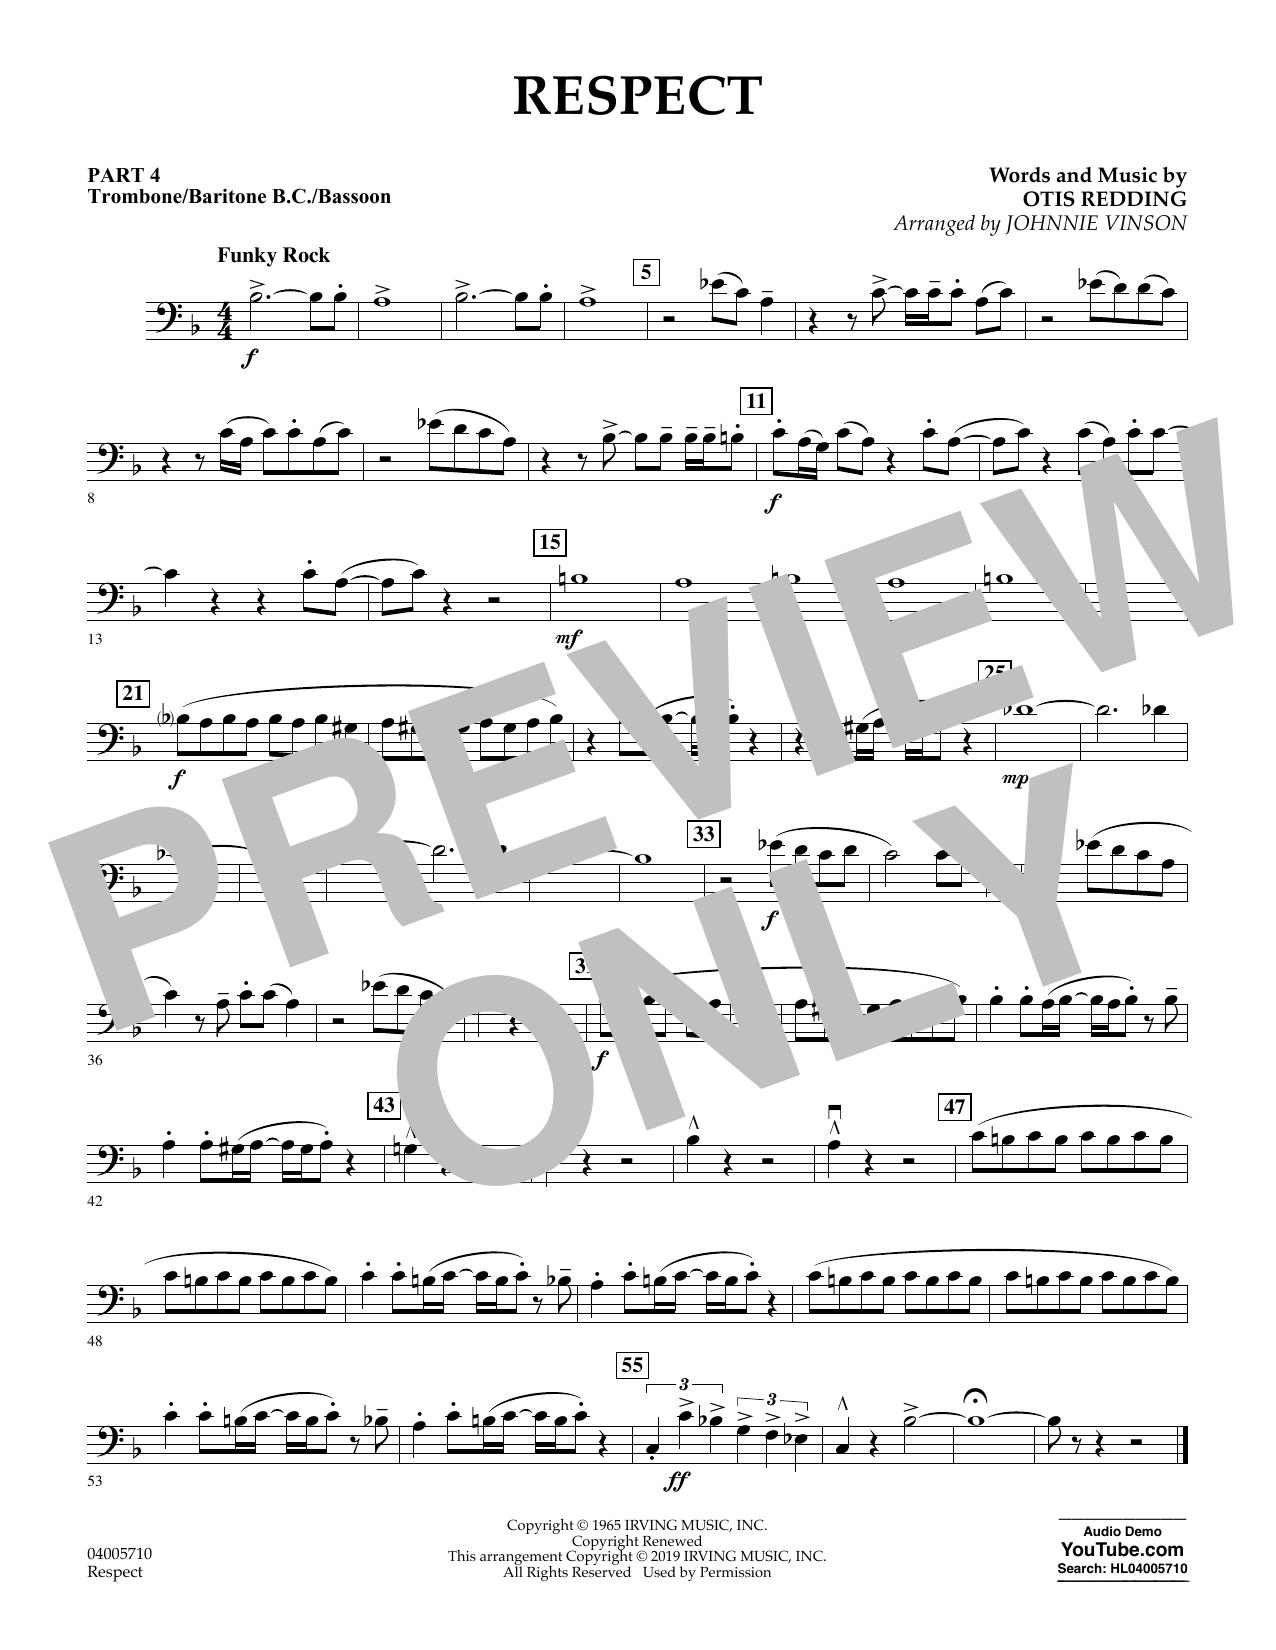 Respect (arr. Johnnie Vinson) - Pt.4 - Trombone/Bar. B.C./Bsn. (Flex-Band)